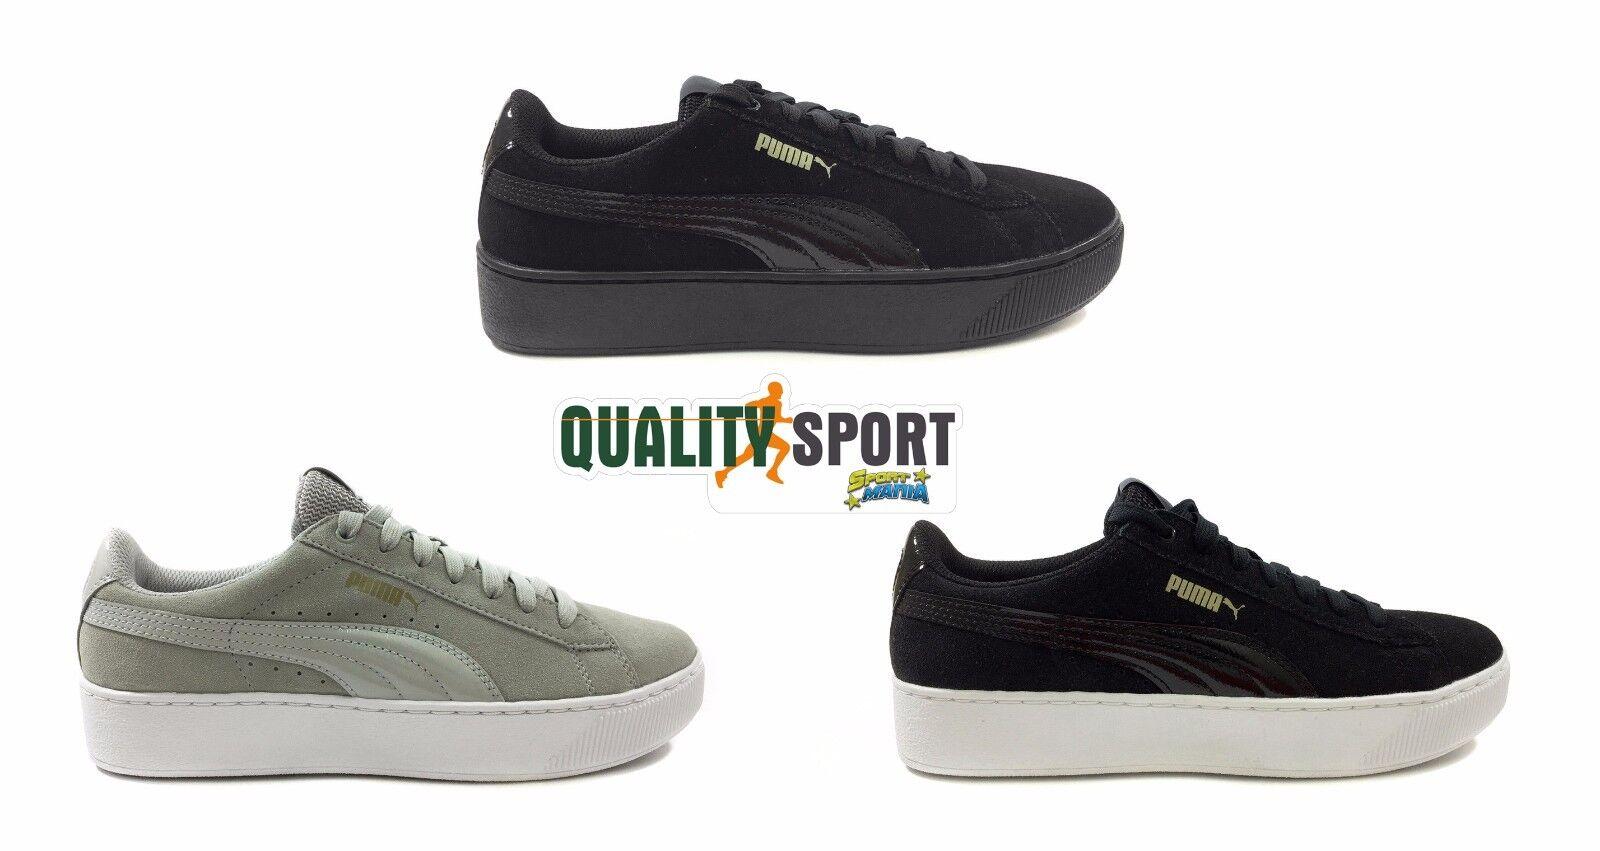 Puma vikky piattaforma nero grigio scarpe scarpe sportive 363287 scarpe da donna